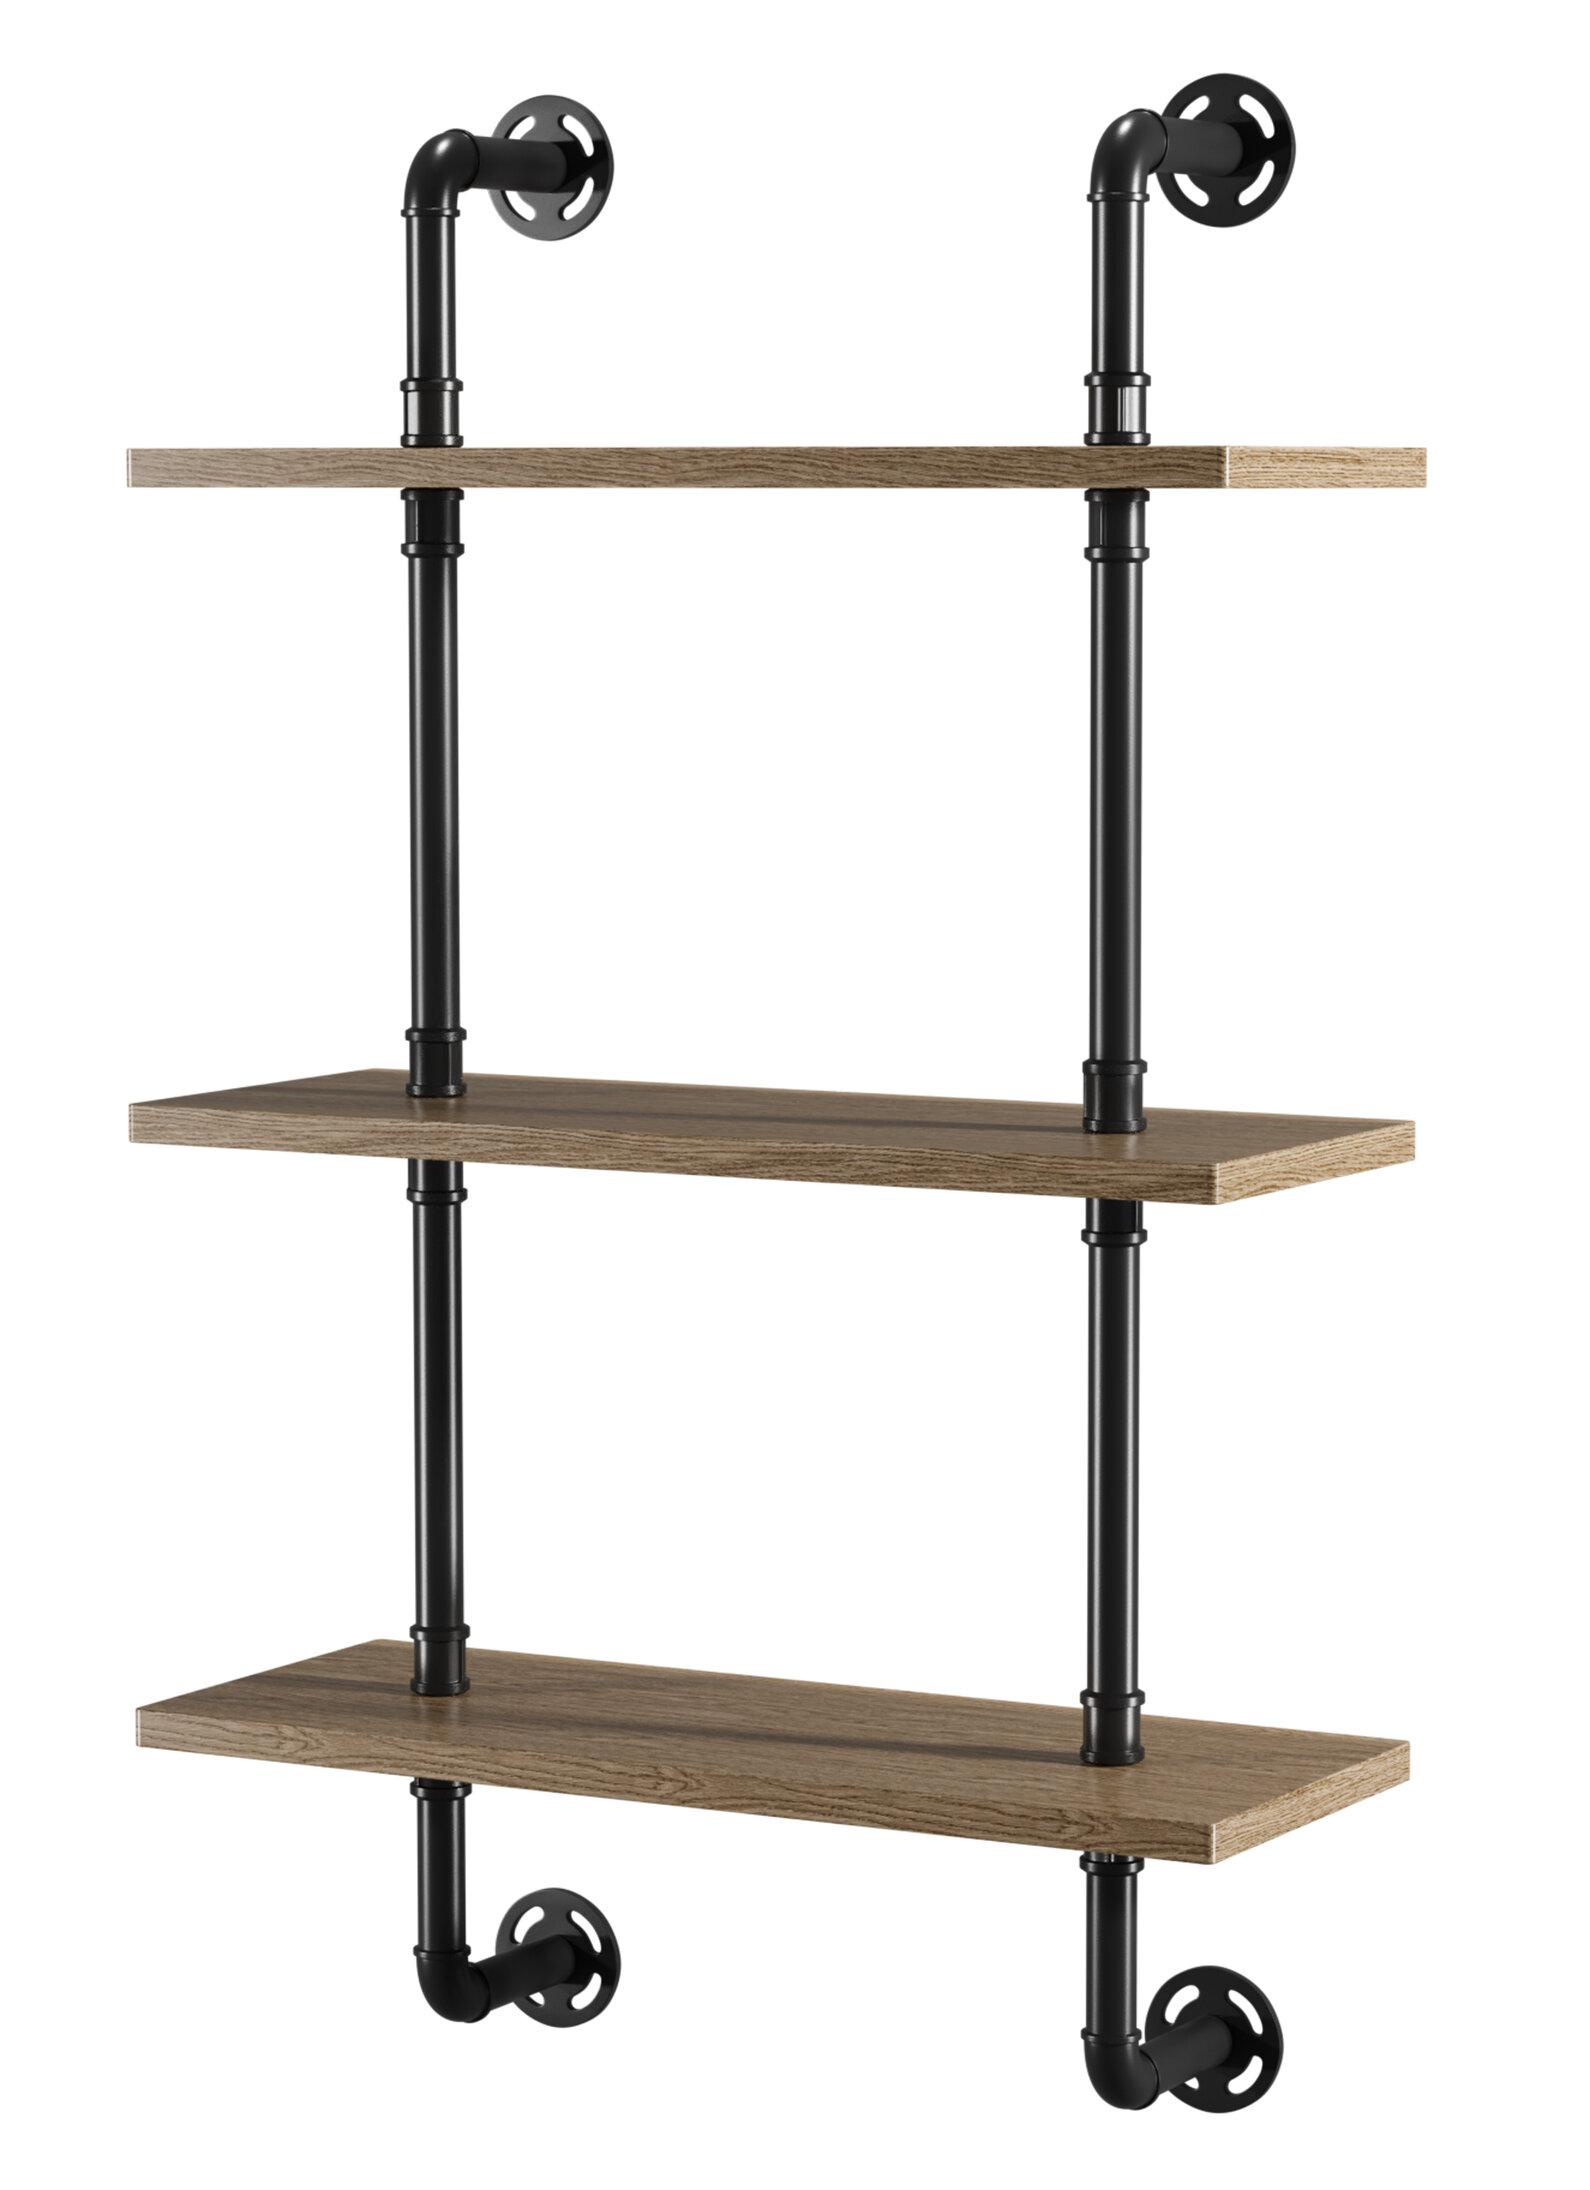 Wayfair S Picks For Collegemetal Wall Display Shelves You Ll Love In 2021 Wayfair